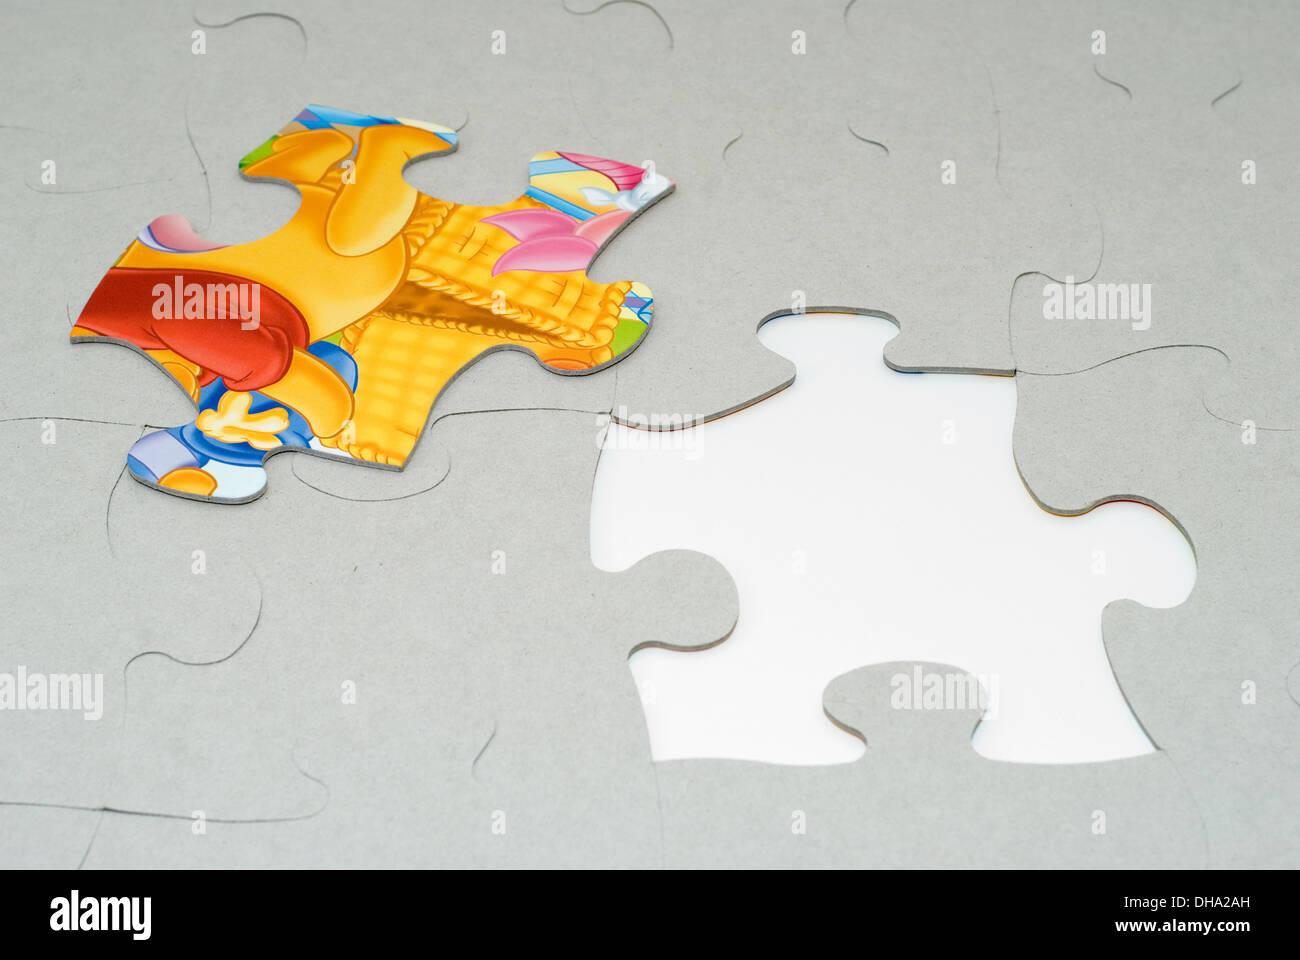 Jigsaw Puzzle Box Stock Photos & Jigsaw Puzzle Box Stock Images - Alamy